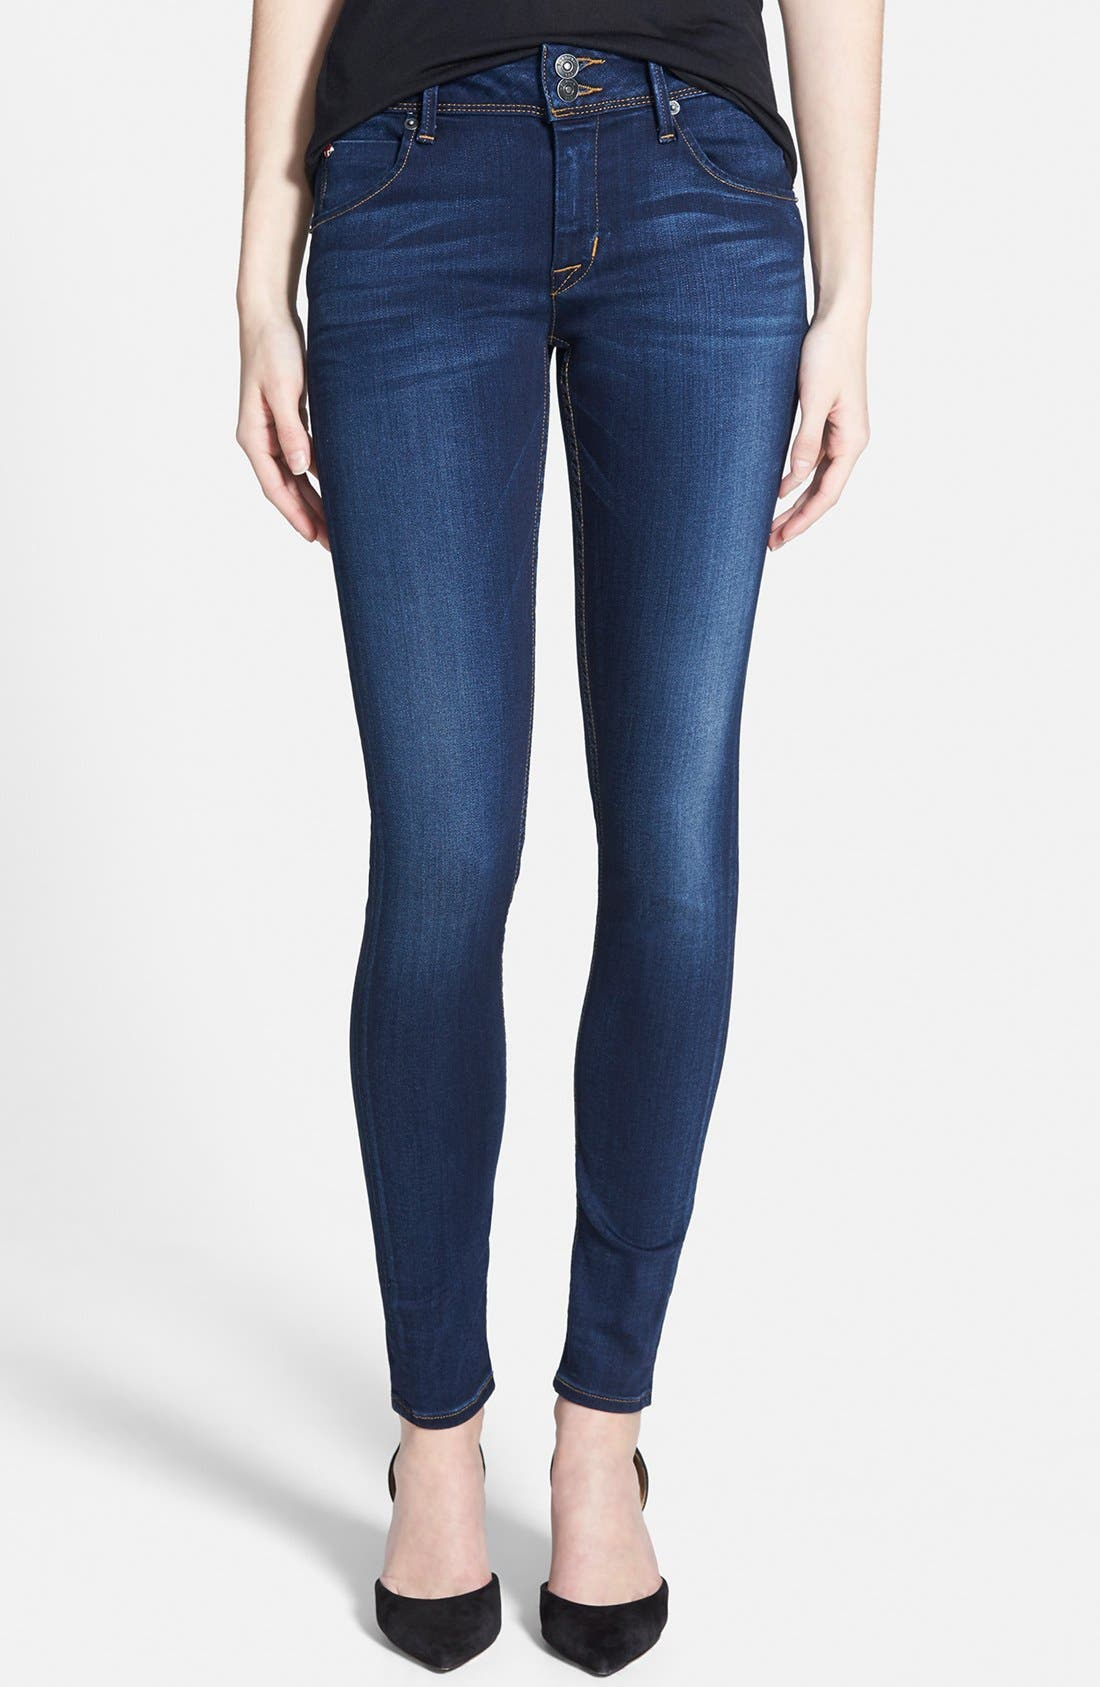 HUDSON JEANS, 'Collin' Supermodel Skinny Jeans, Main thumbnail 1, color, 423